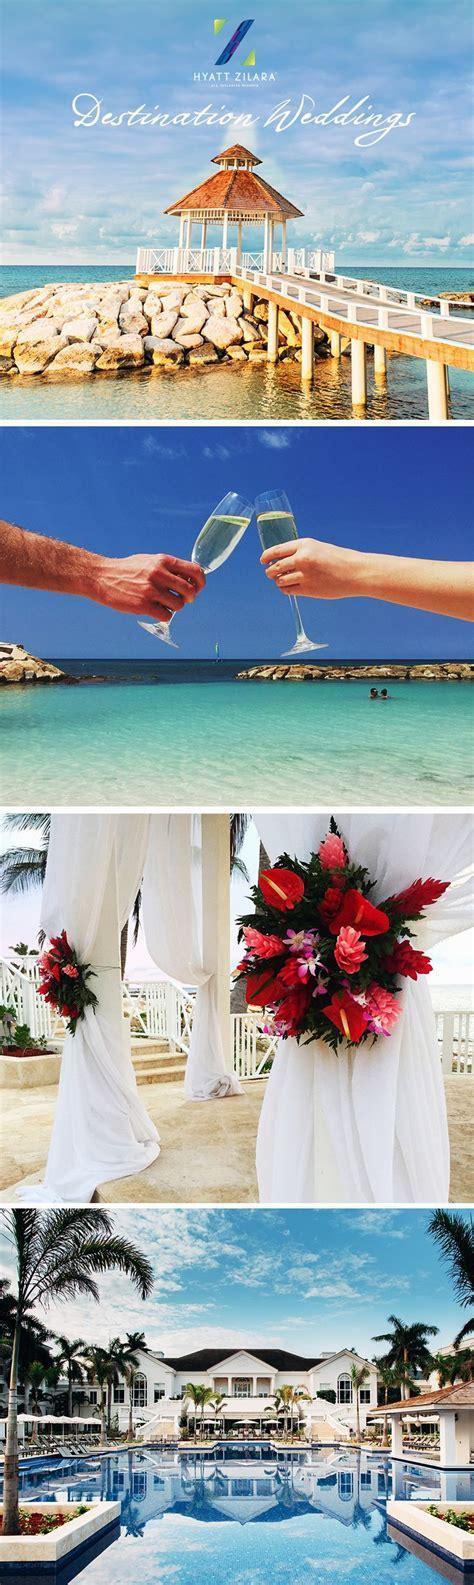 Best 25  Jamaican wedding ideas on Pinterest   Wedding